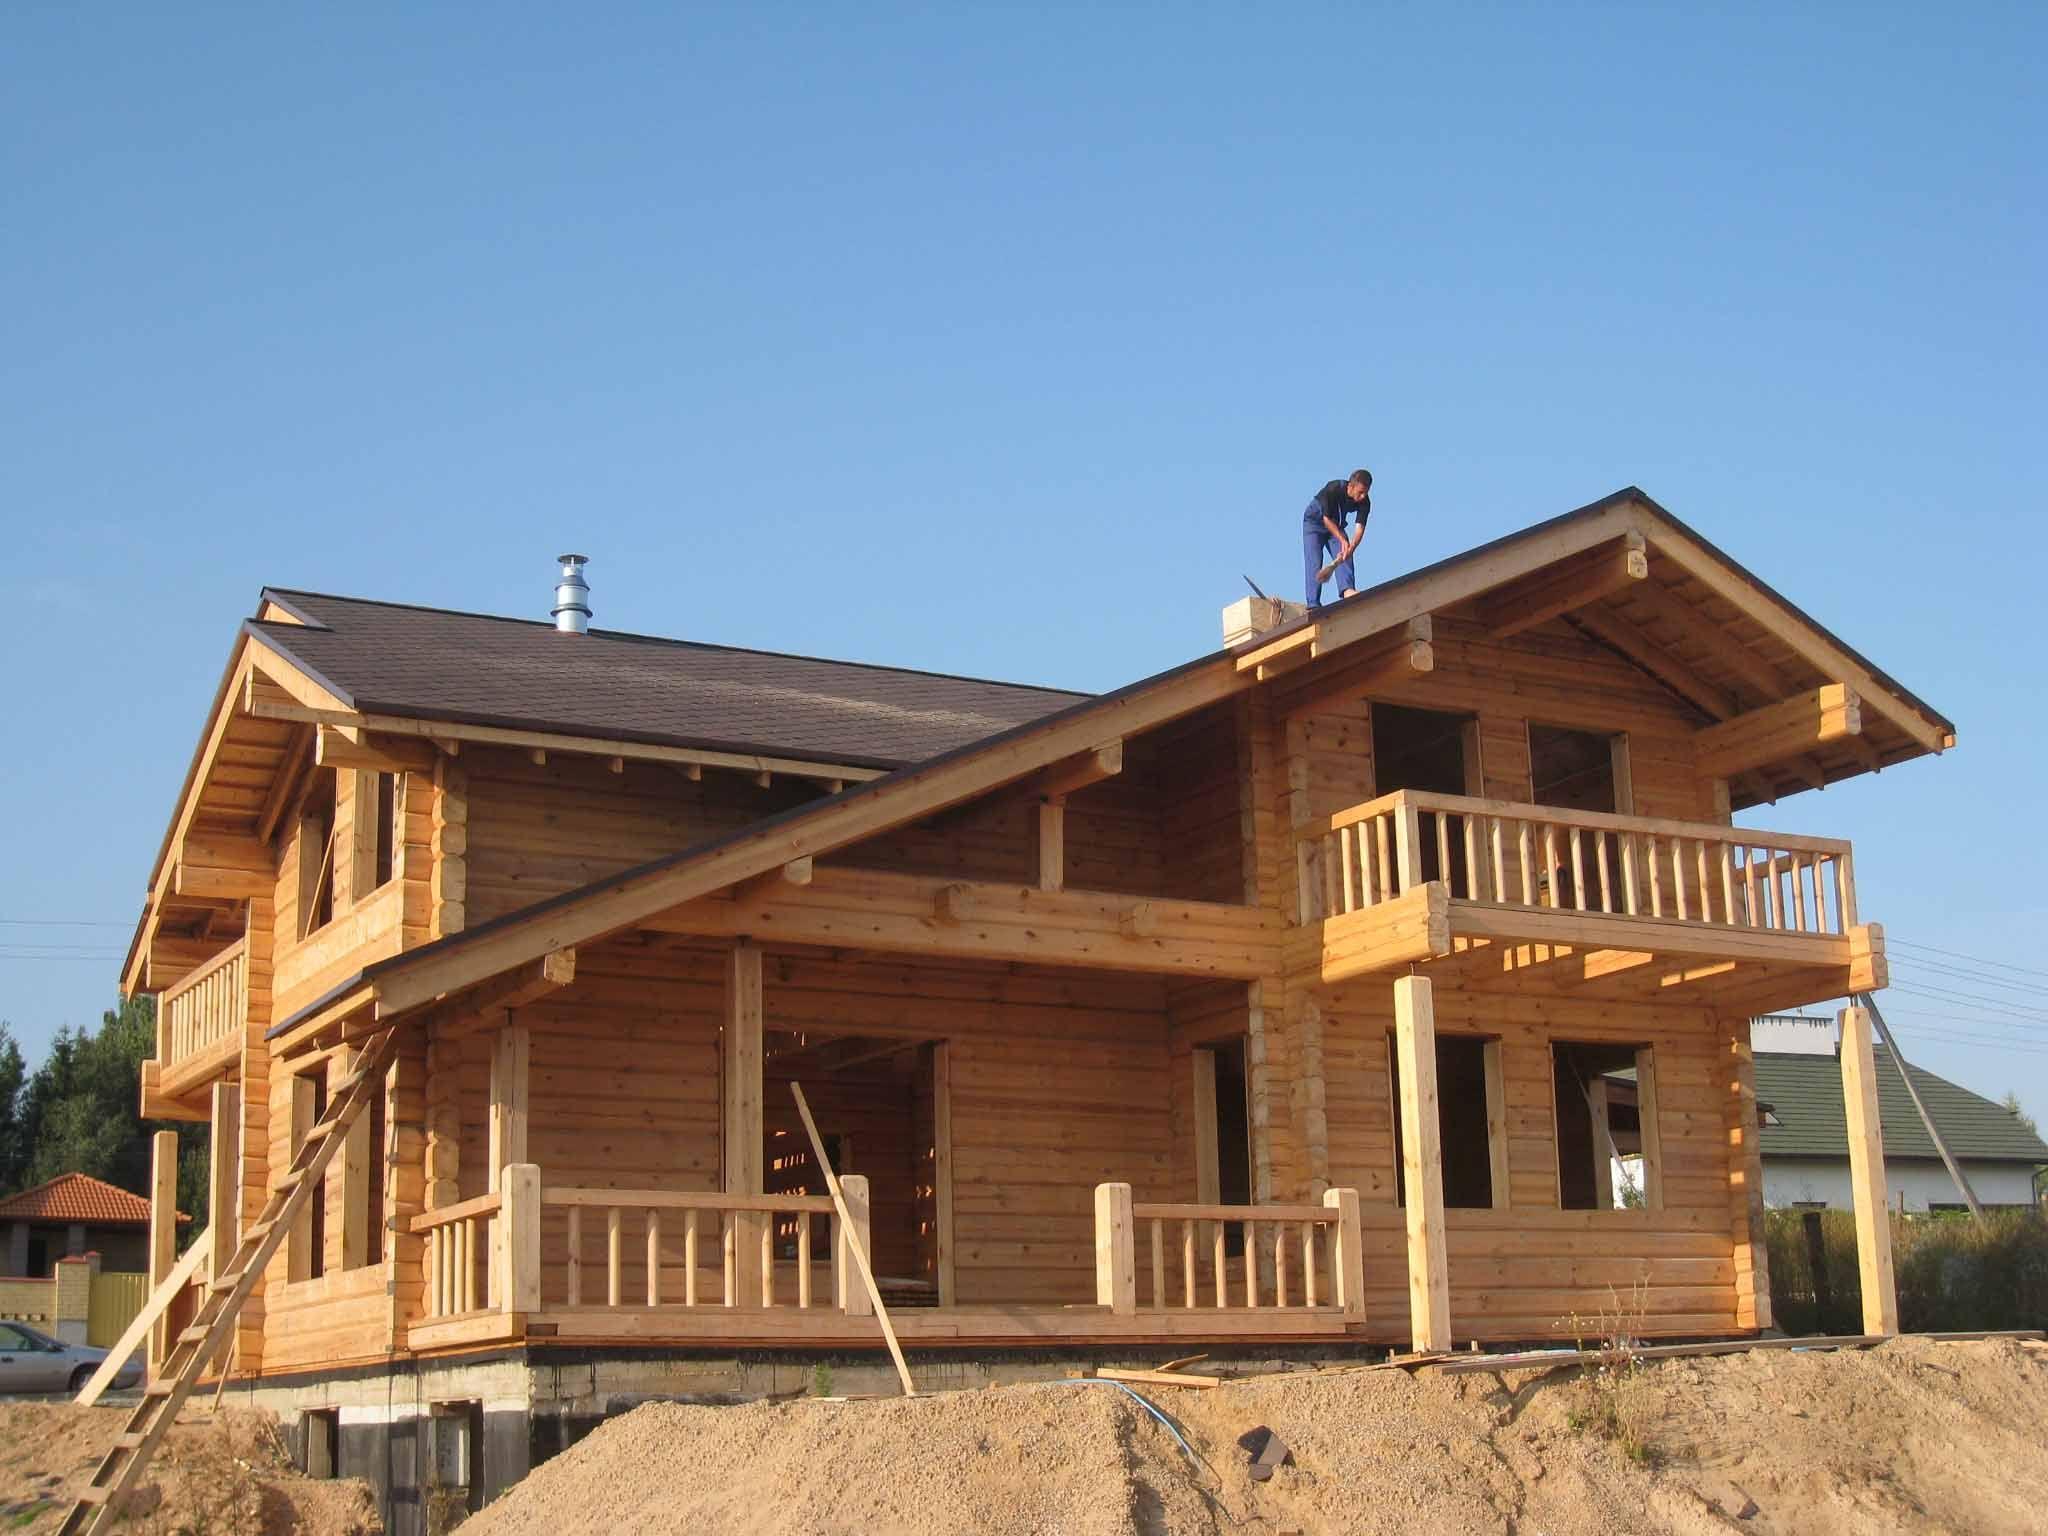 Casas de madera casfi casas de madera casas rusticas for Casas prefabricadas pequenas